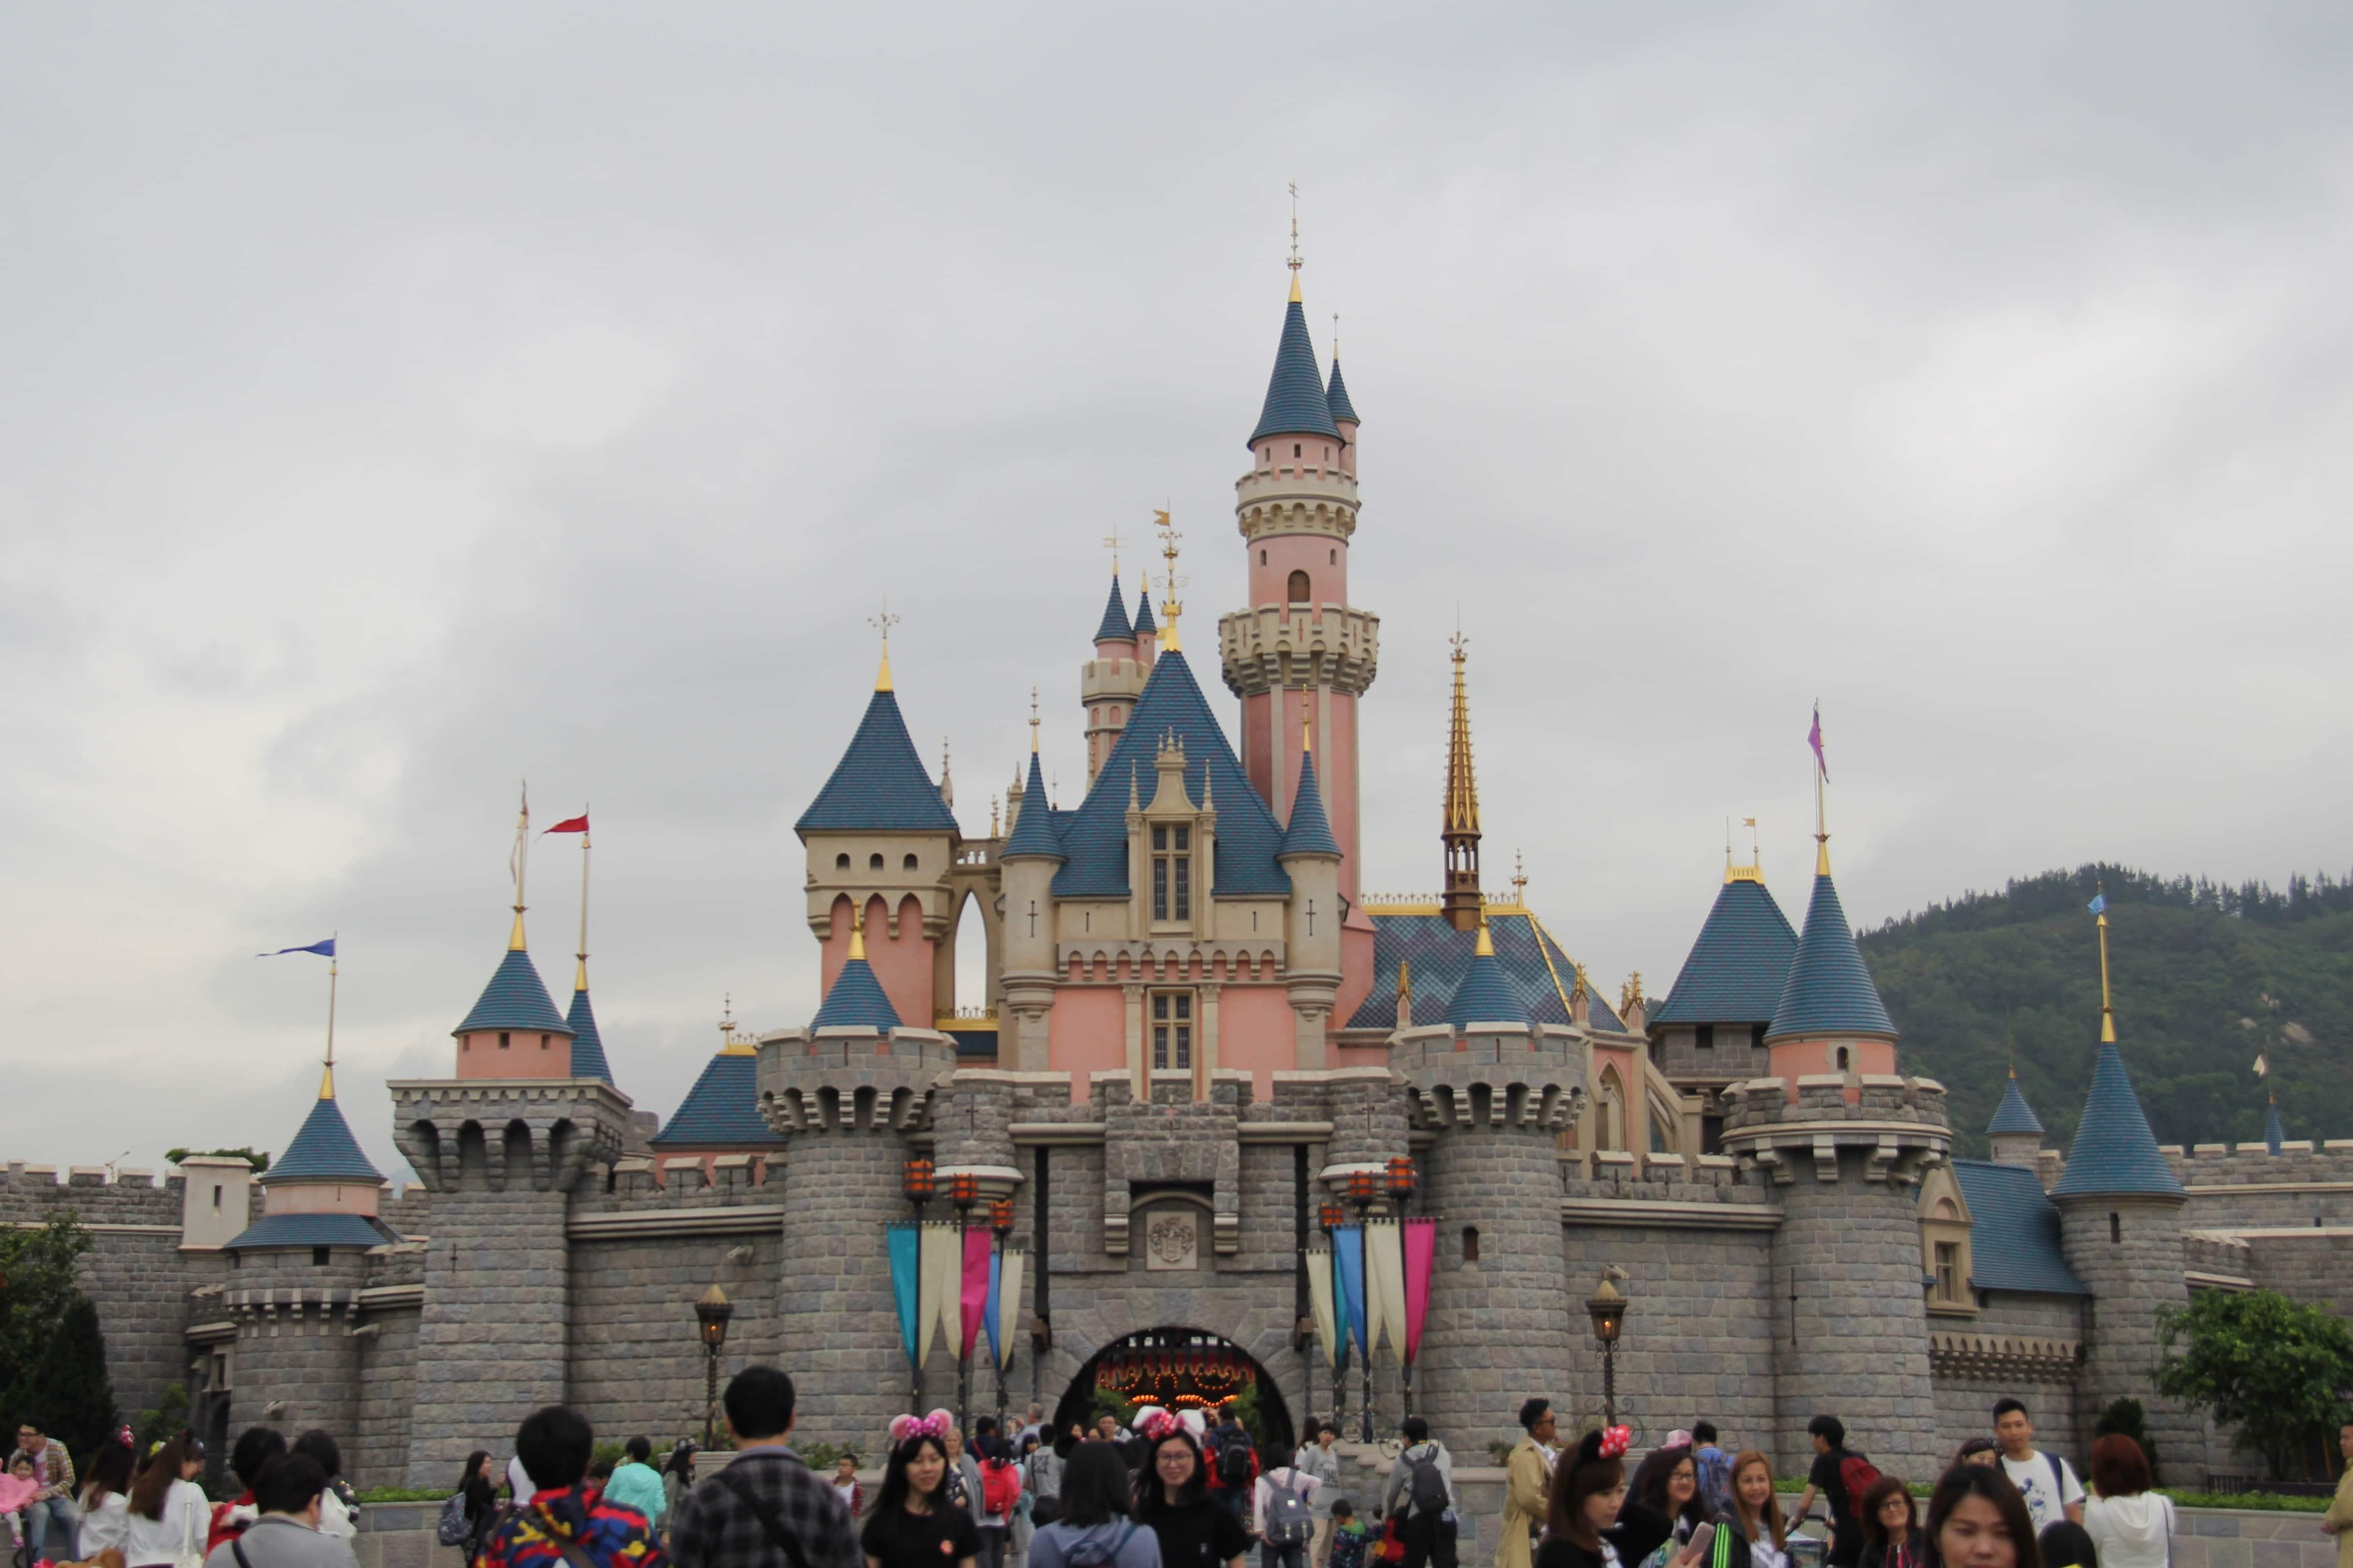 Hong Kong Disneyland 12th Anniversary Celebration - Travel to the Magic